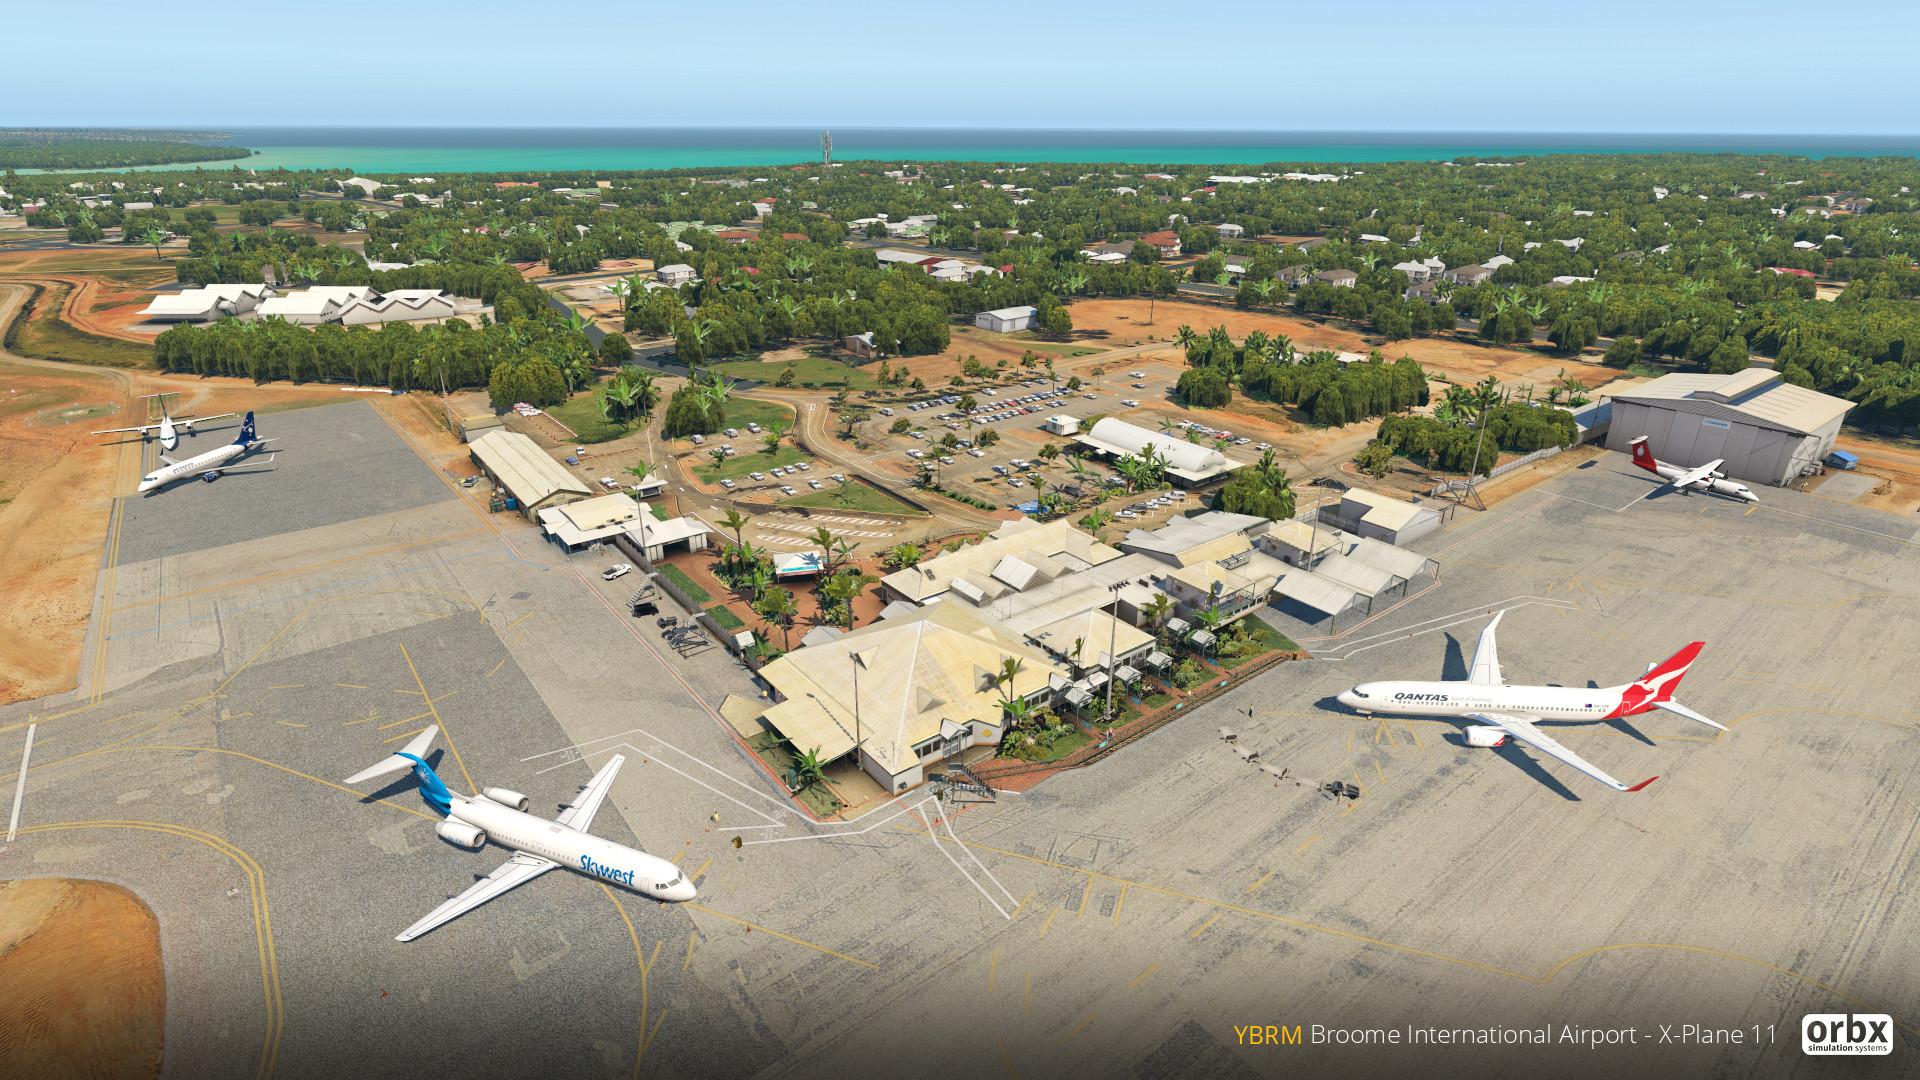 YBRM Broome International Airport - X-Plane 11